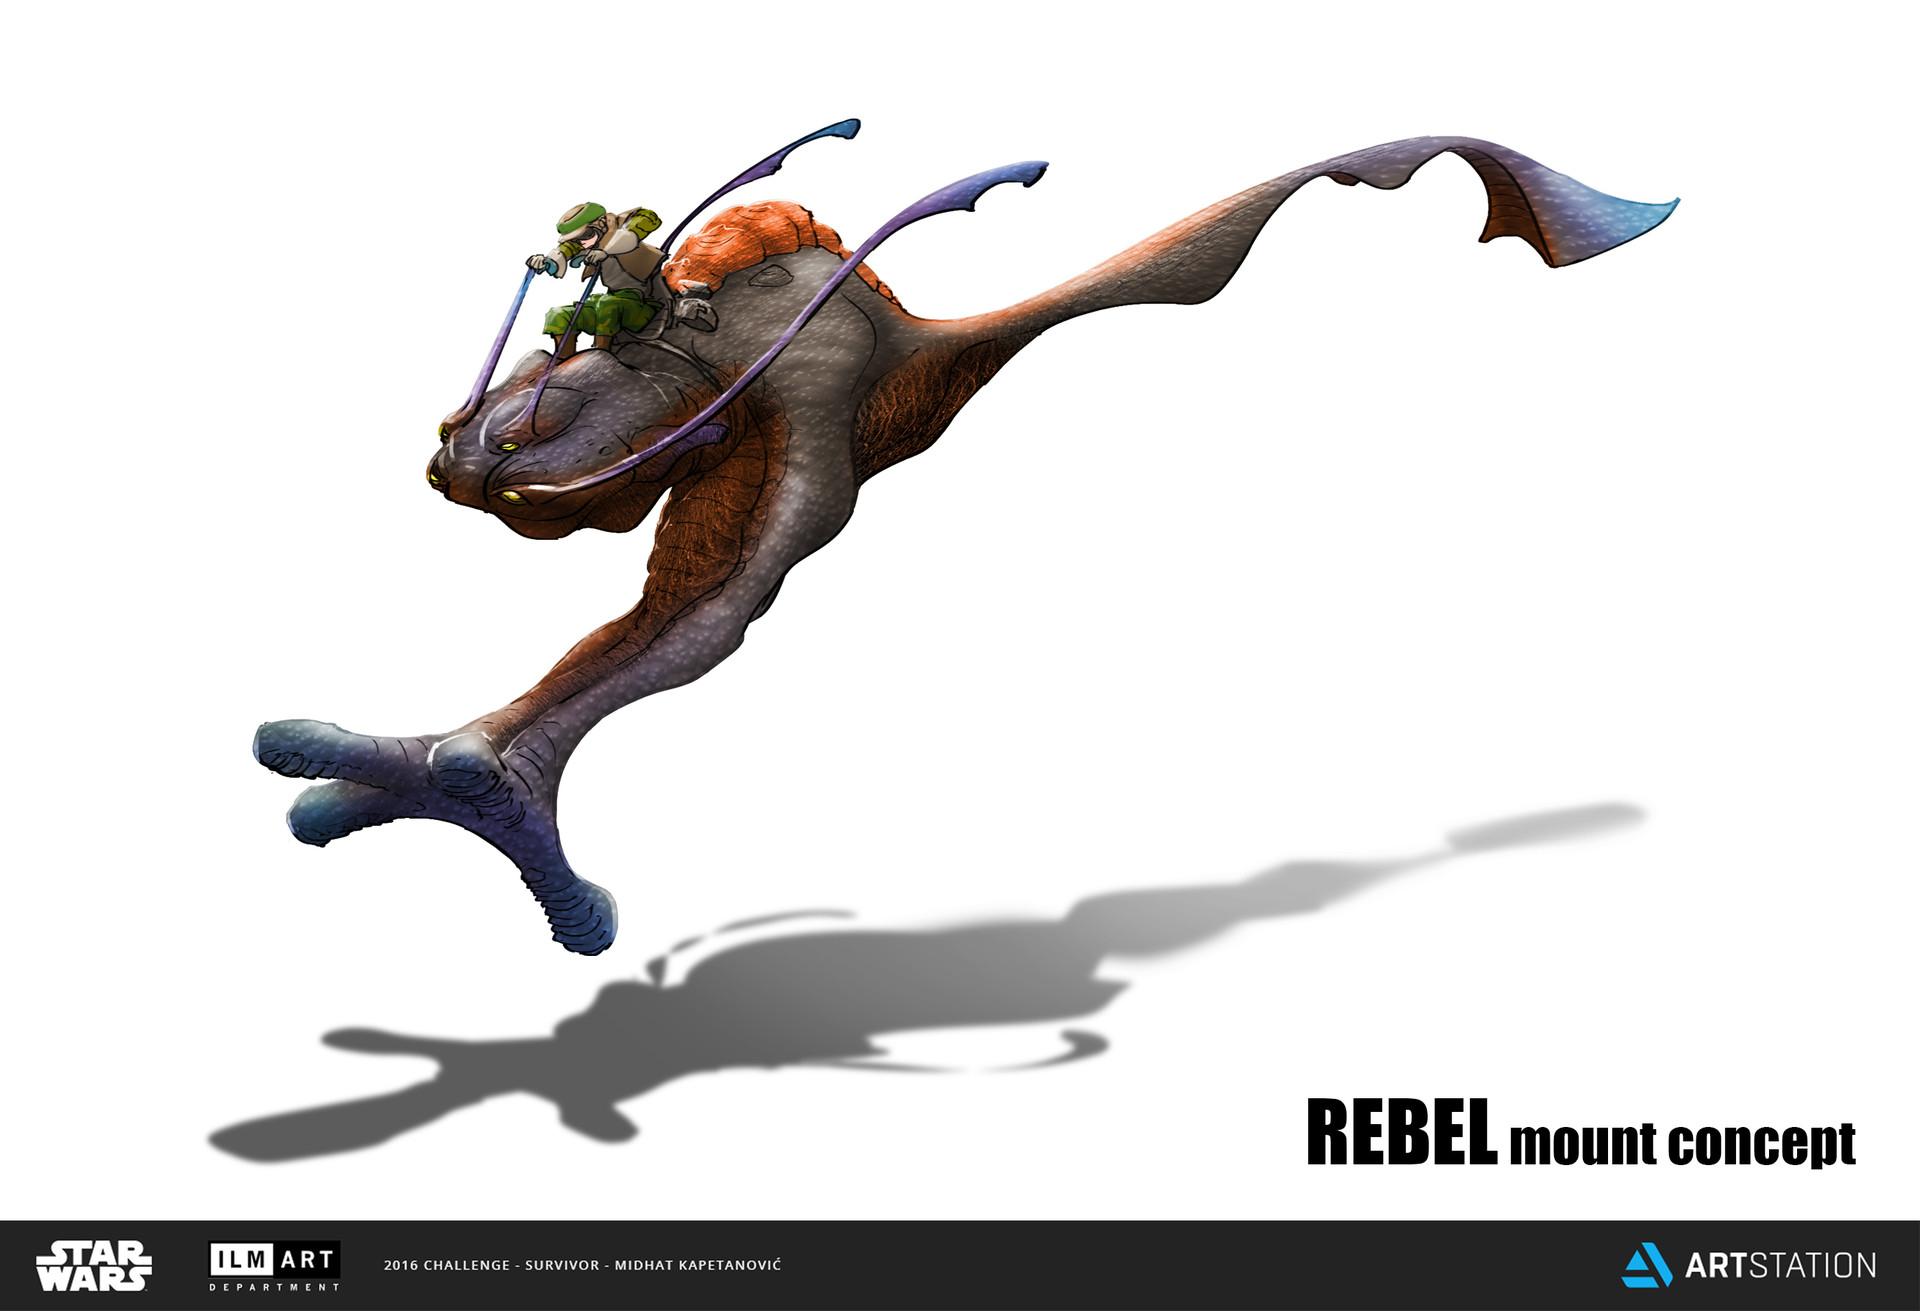 Midhat kapetanovic concepts jumper creature01